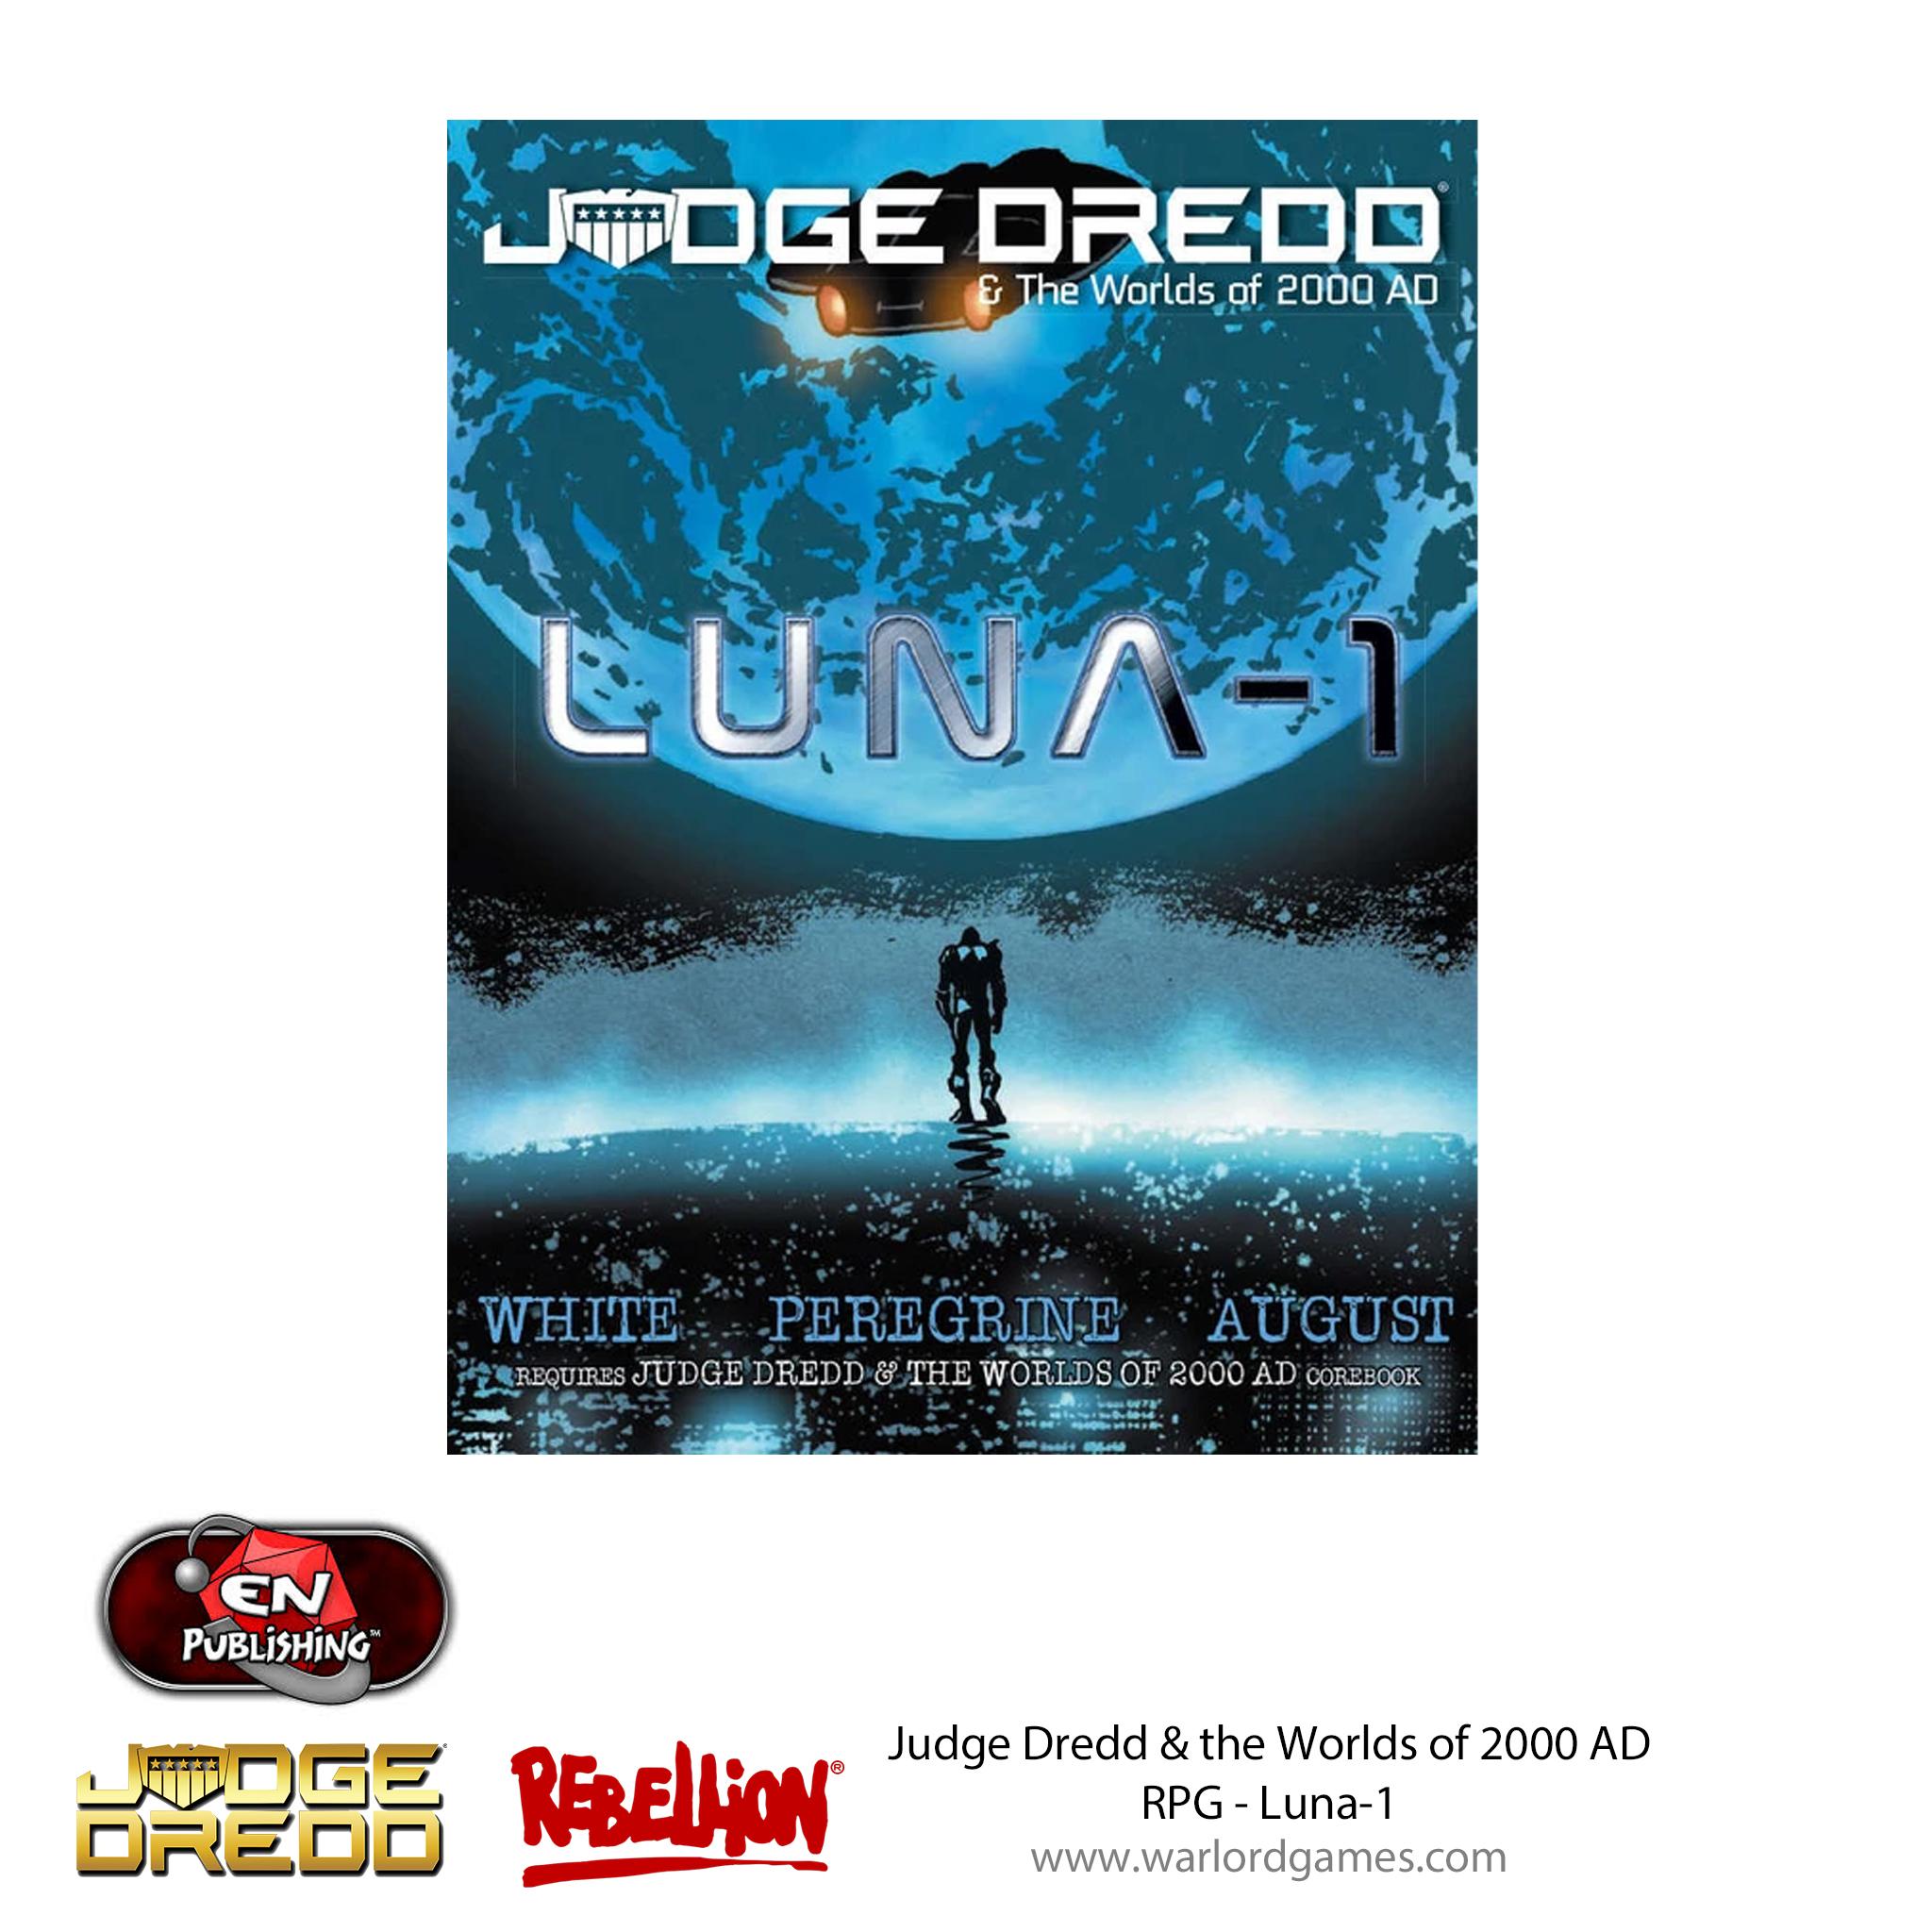 Judge Dredd RPG - Luna-1